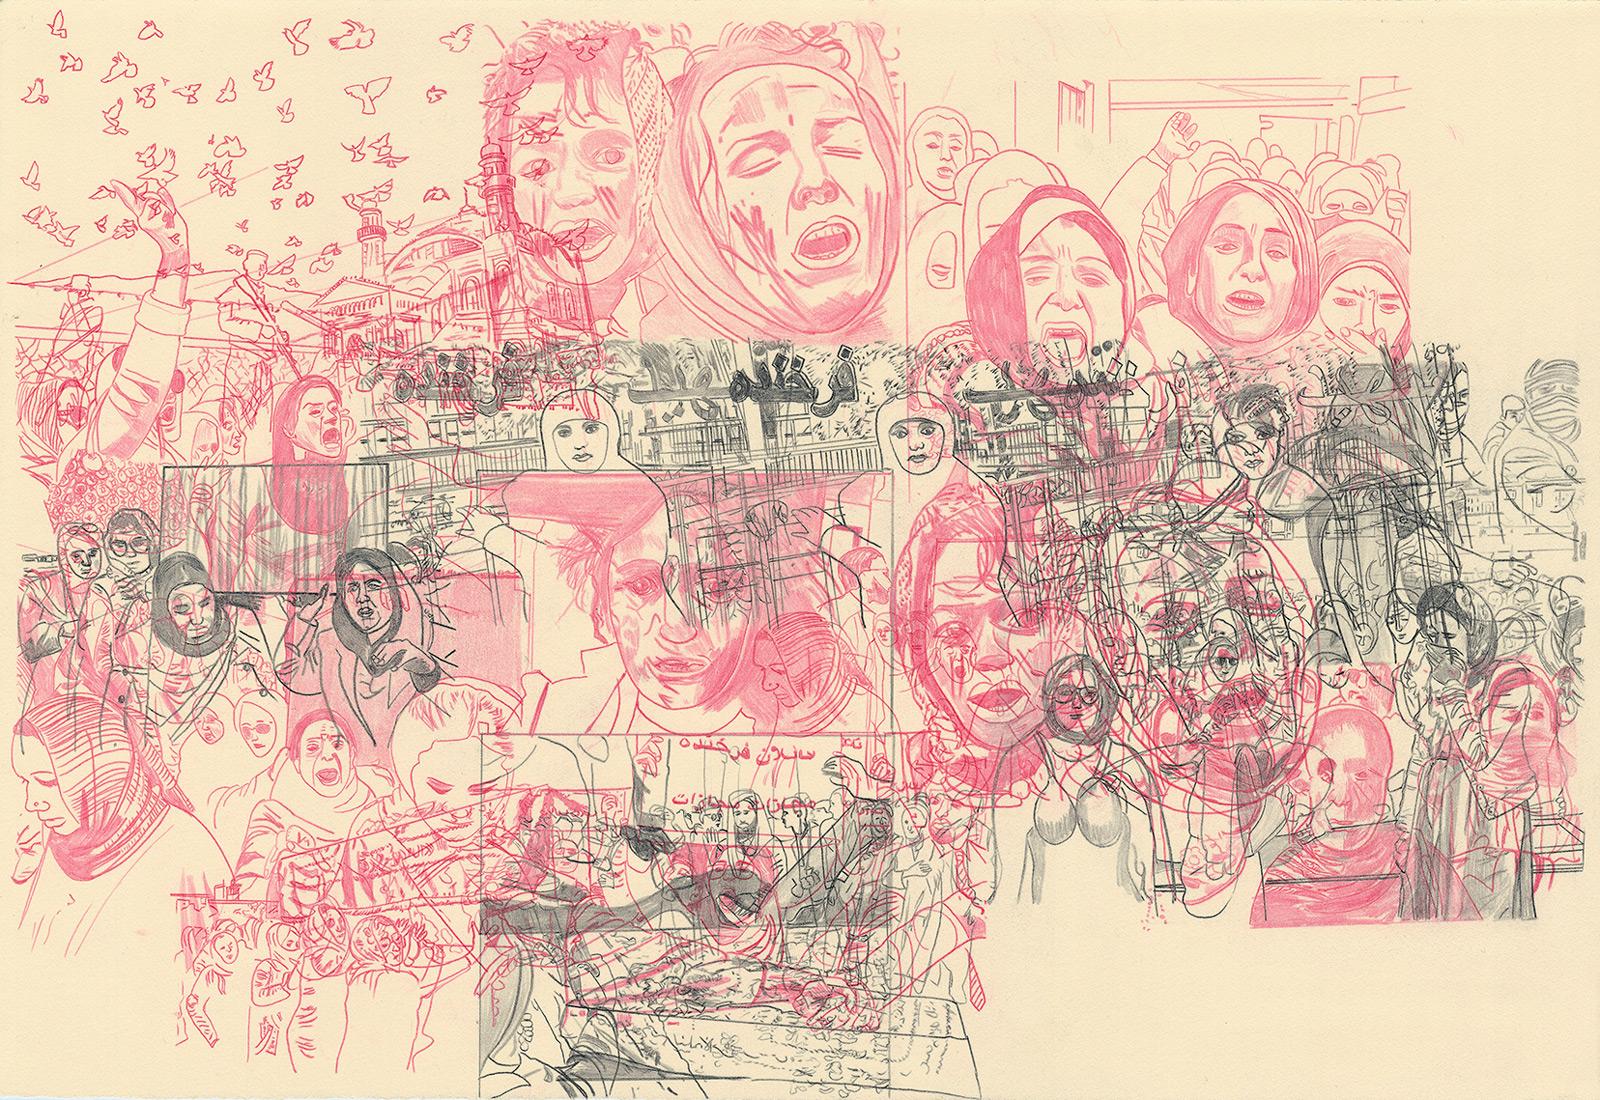 Deborah-Koenker-Visual-Artist-Vancouver_Draw-the-world-Spain